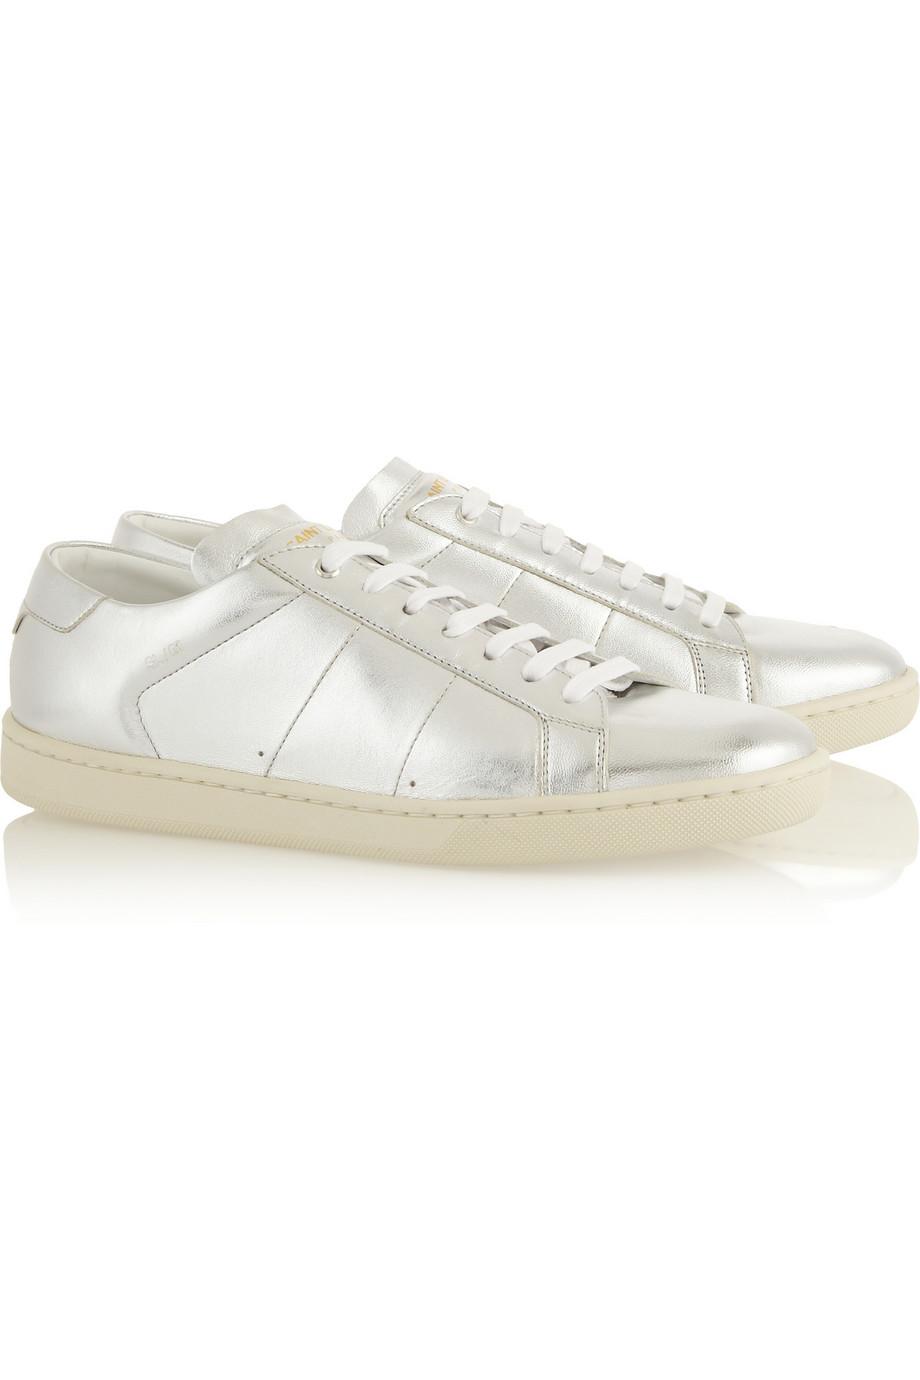 SAINT LAURENTMetallic leather sneakers